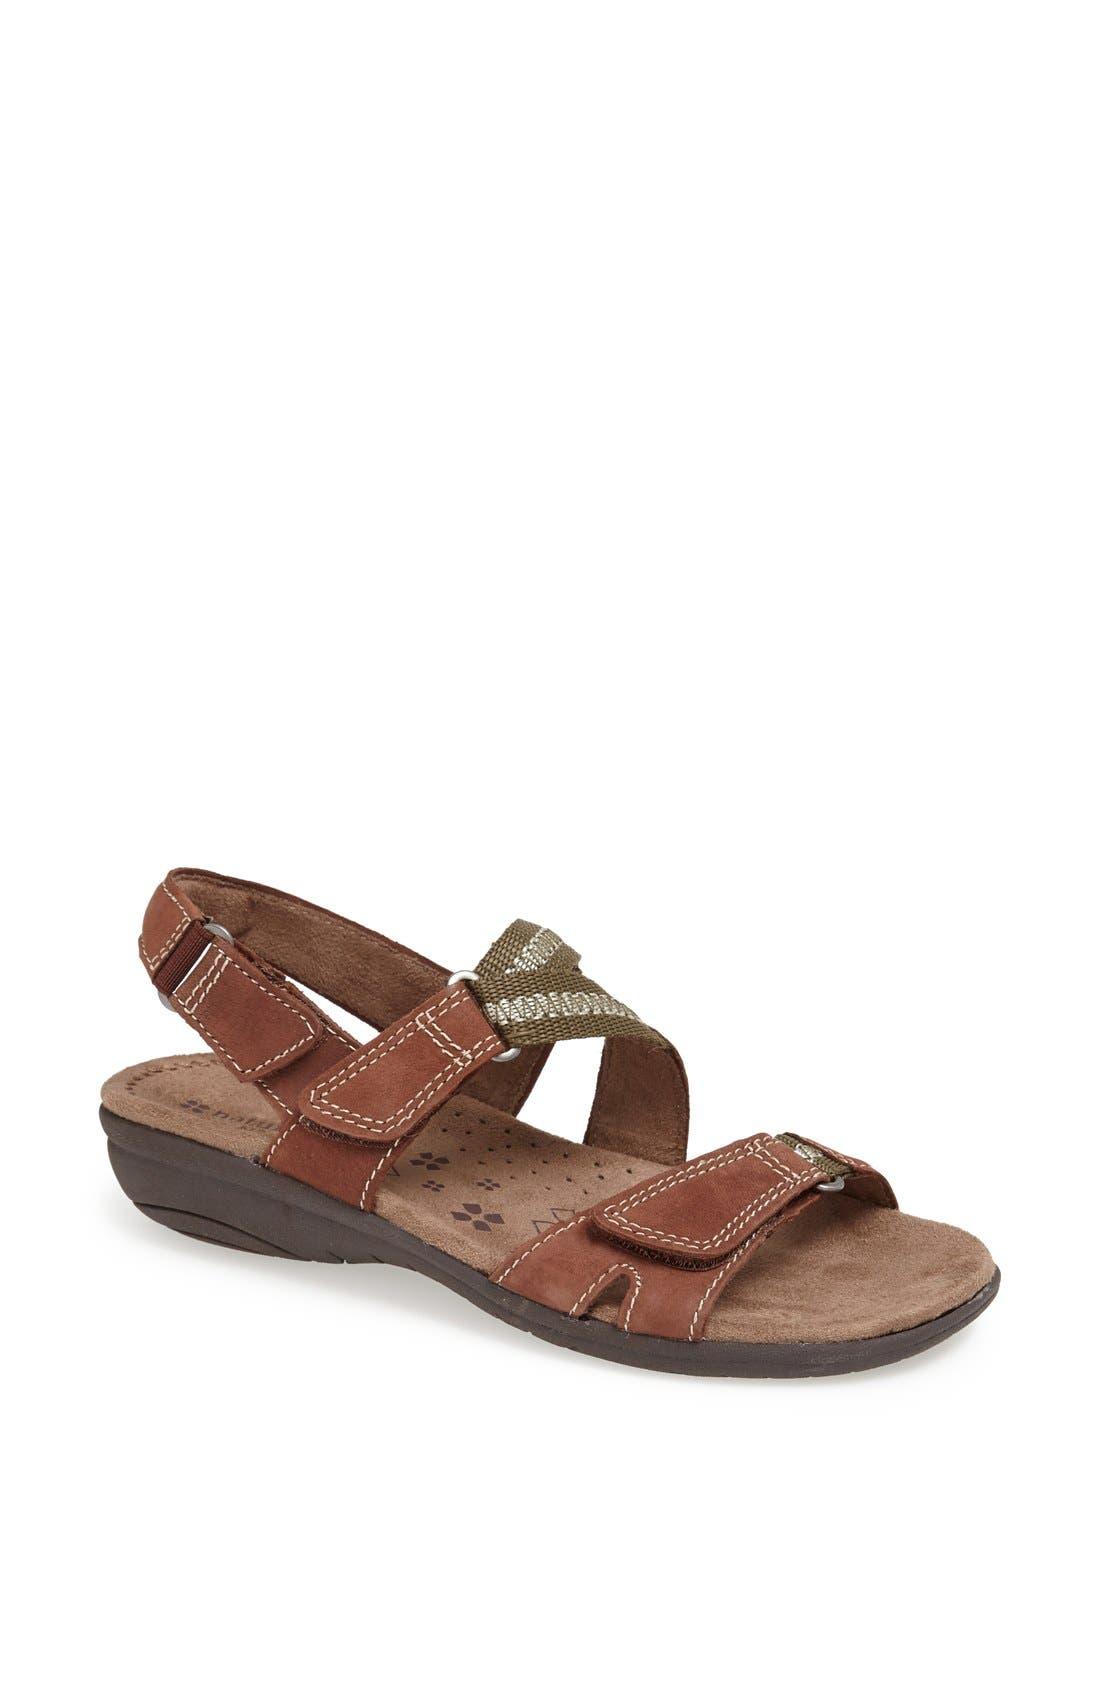 Main Image - Naturalizer 'Valero' Sandal